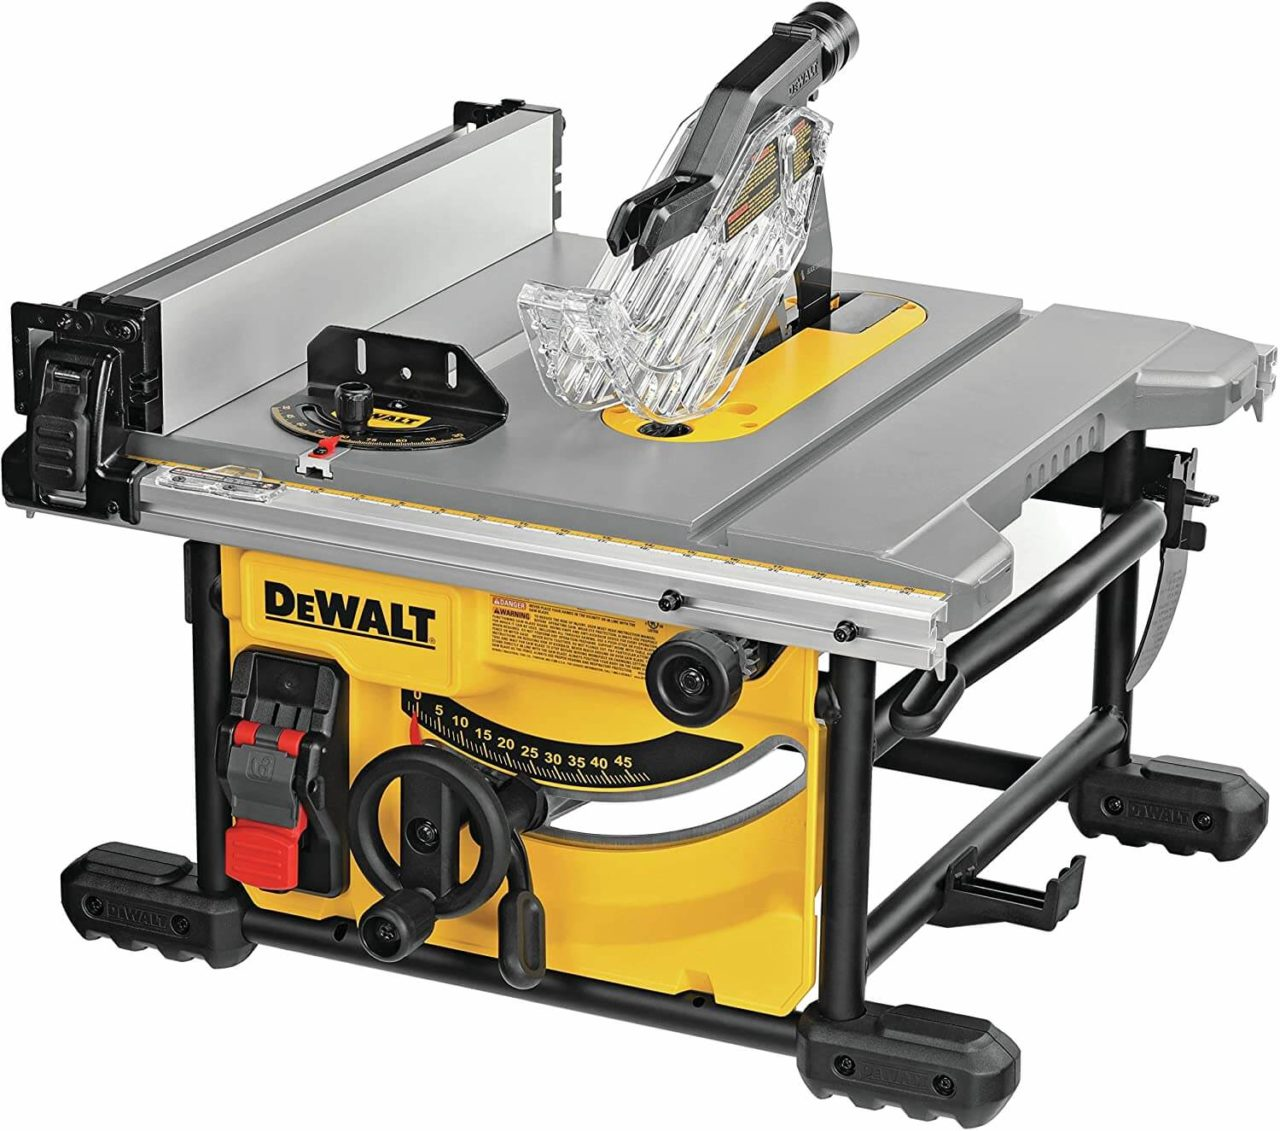 DeWALT DWE7485 - best table saw for beginners